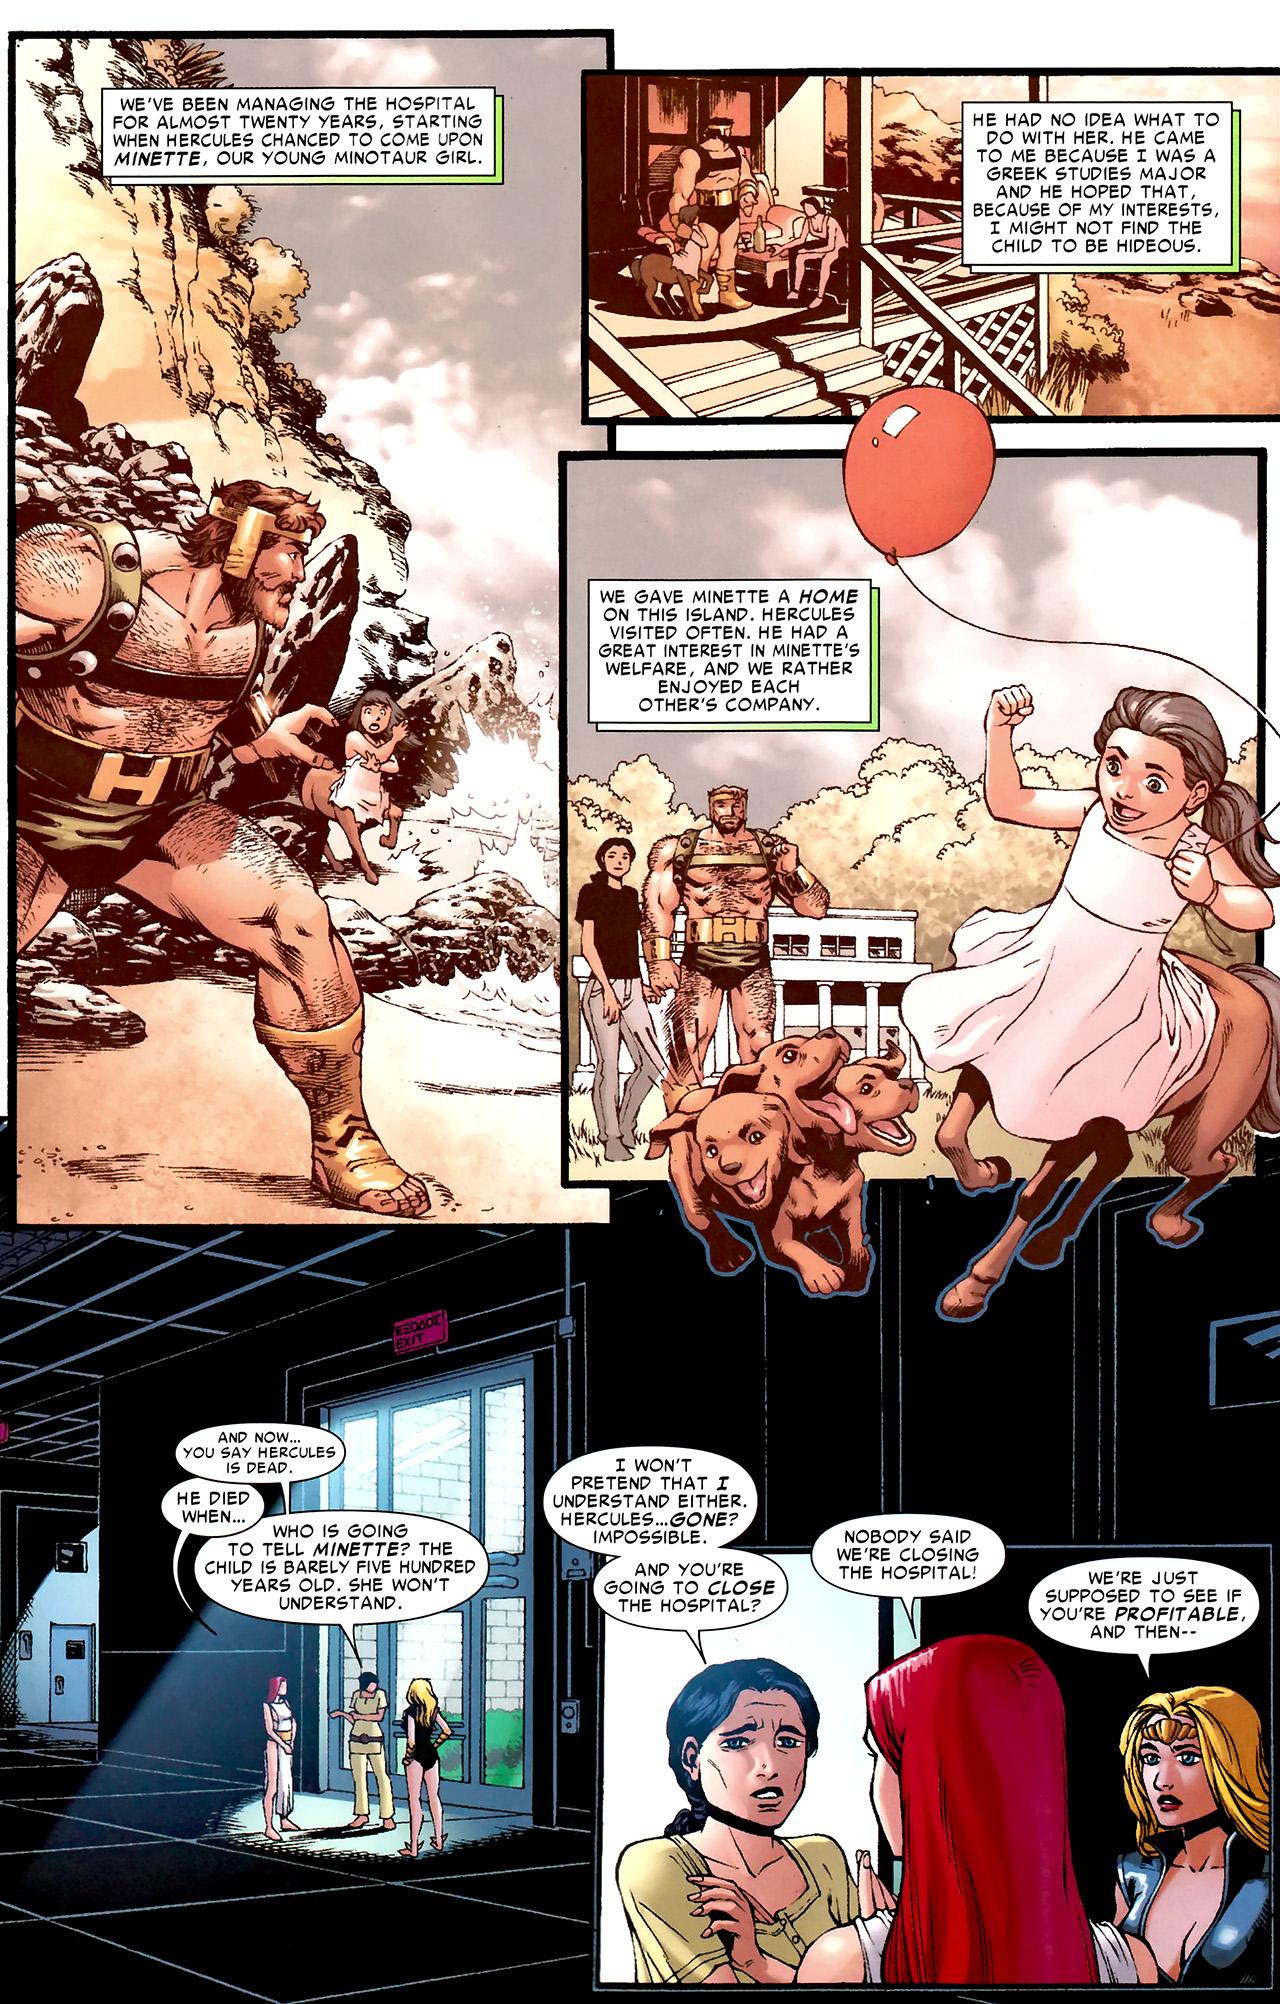 Read online Hercules: Fall of an Avenger comic -  Issue #2 - 28